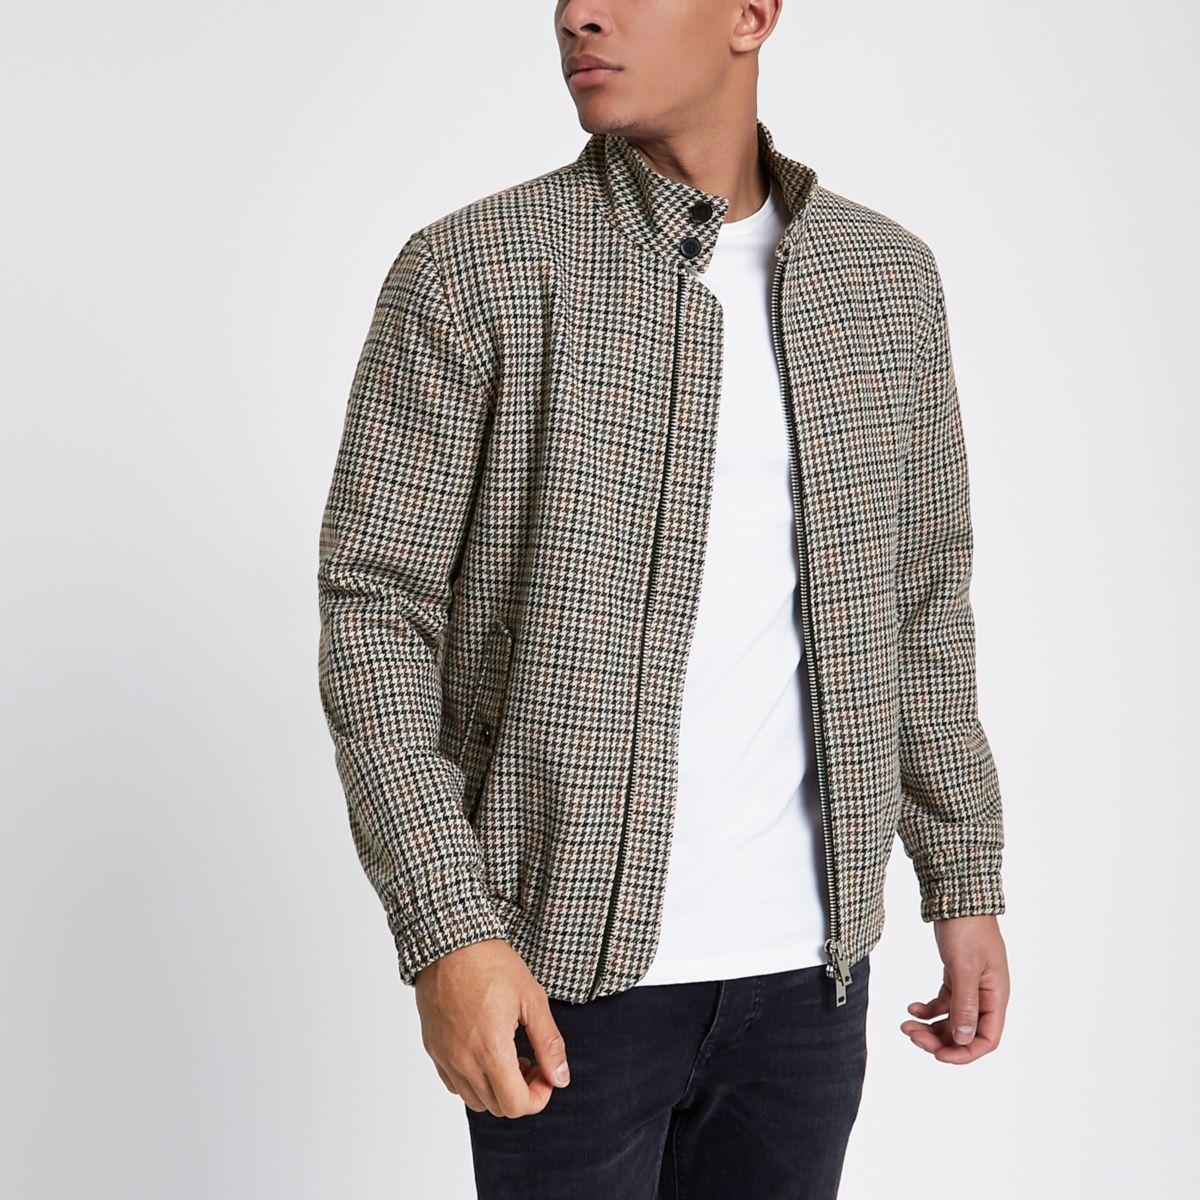 Brown check harrington jacket